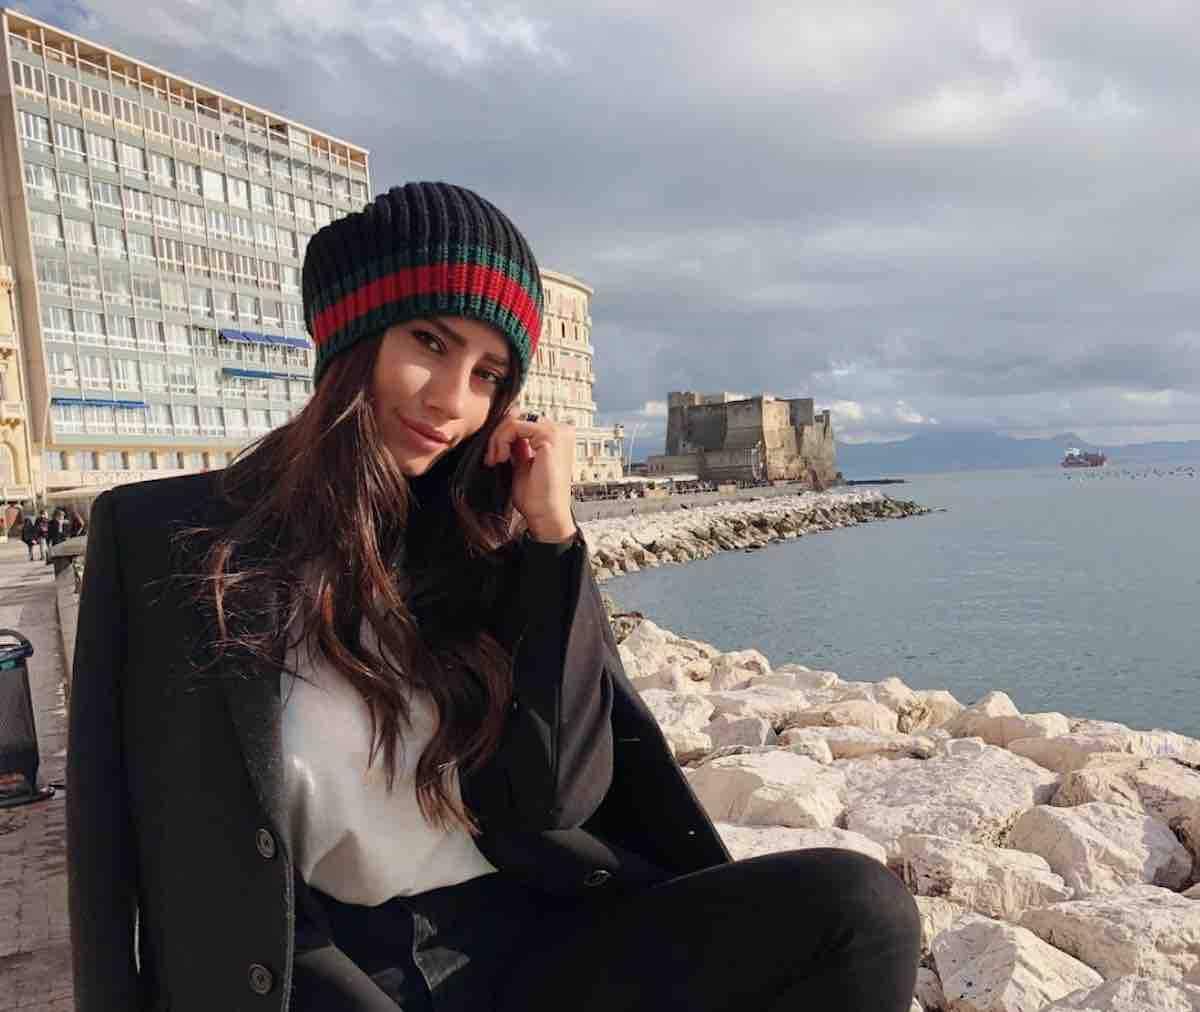 Angela Nasti chi  Et altezza carriera vita privata